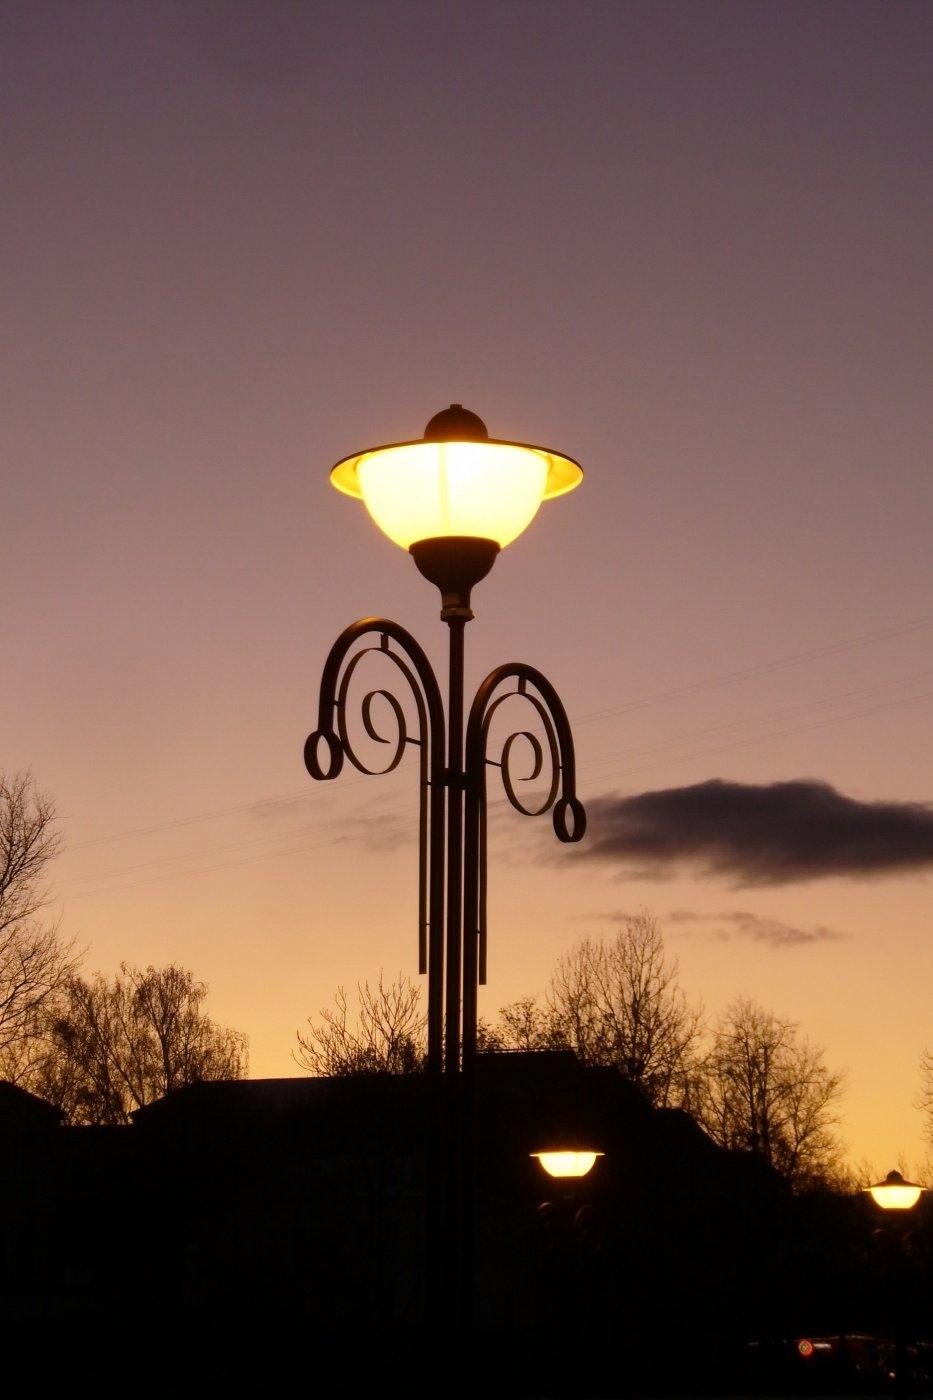 анимация картинки фонари на улице